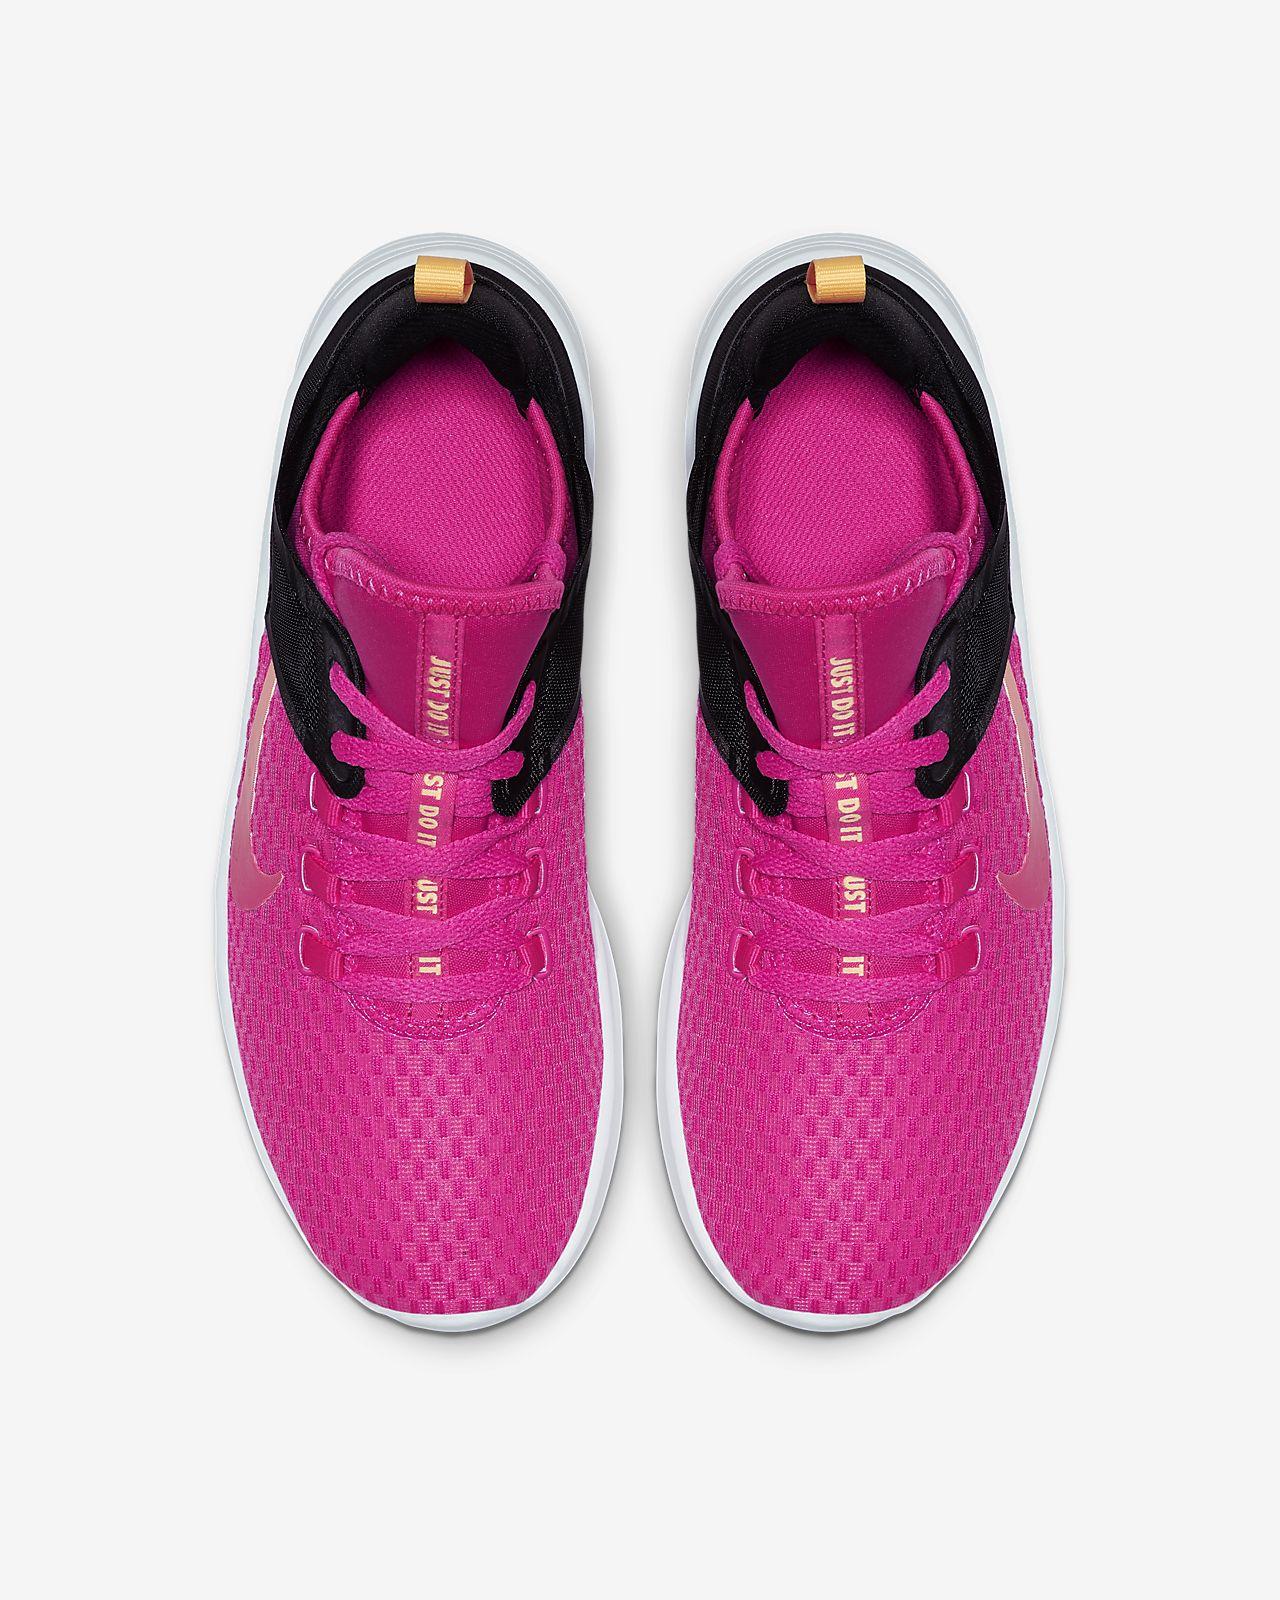 85abd2c8a6534 Dámská tréninková bota Nike Air Max Bella TR 2. Nike.com CZ